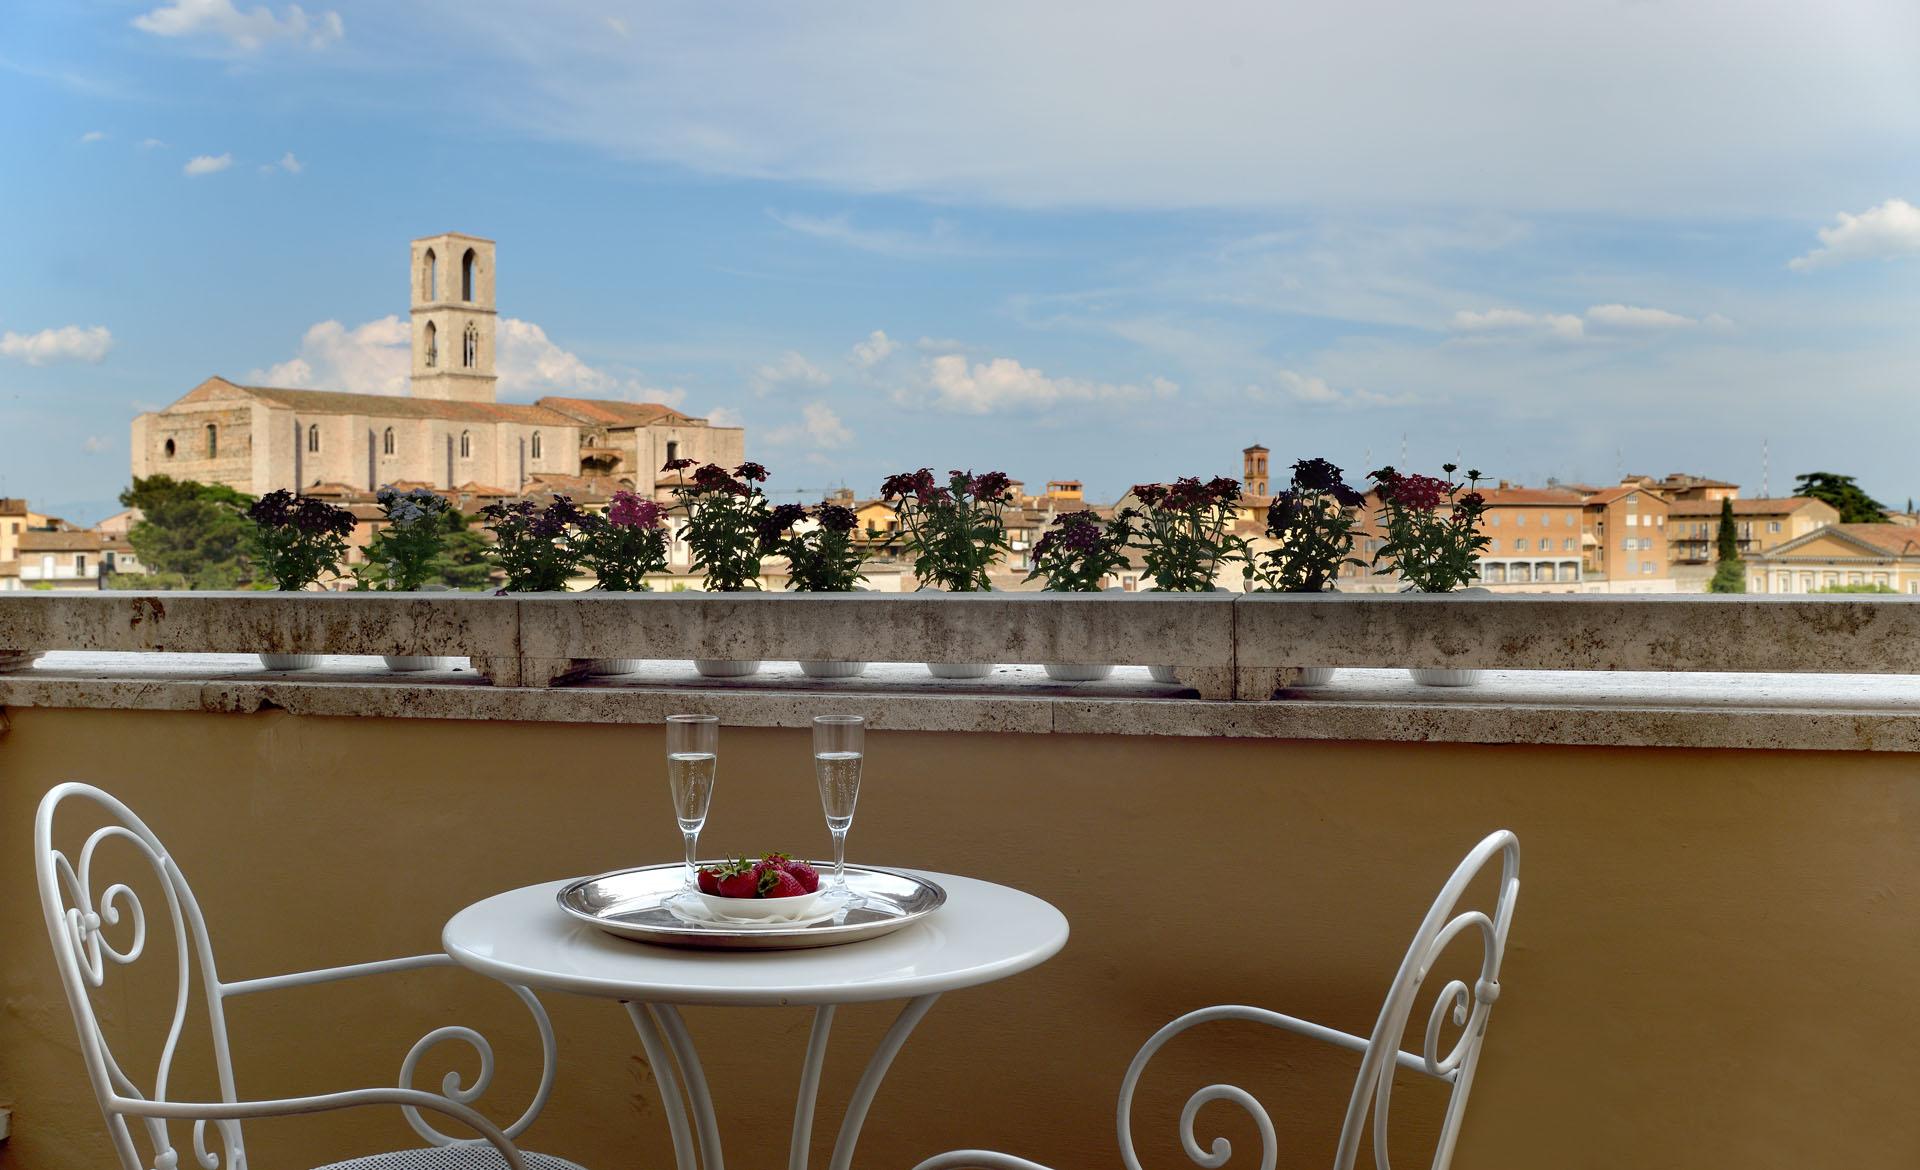 hotel sangallo palace perugia recensioni trattoria - photo#30